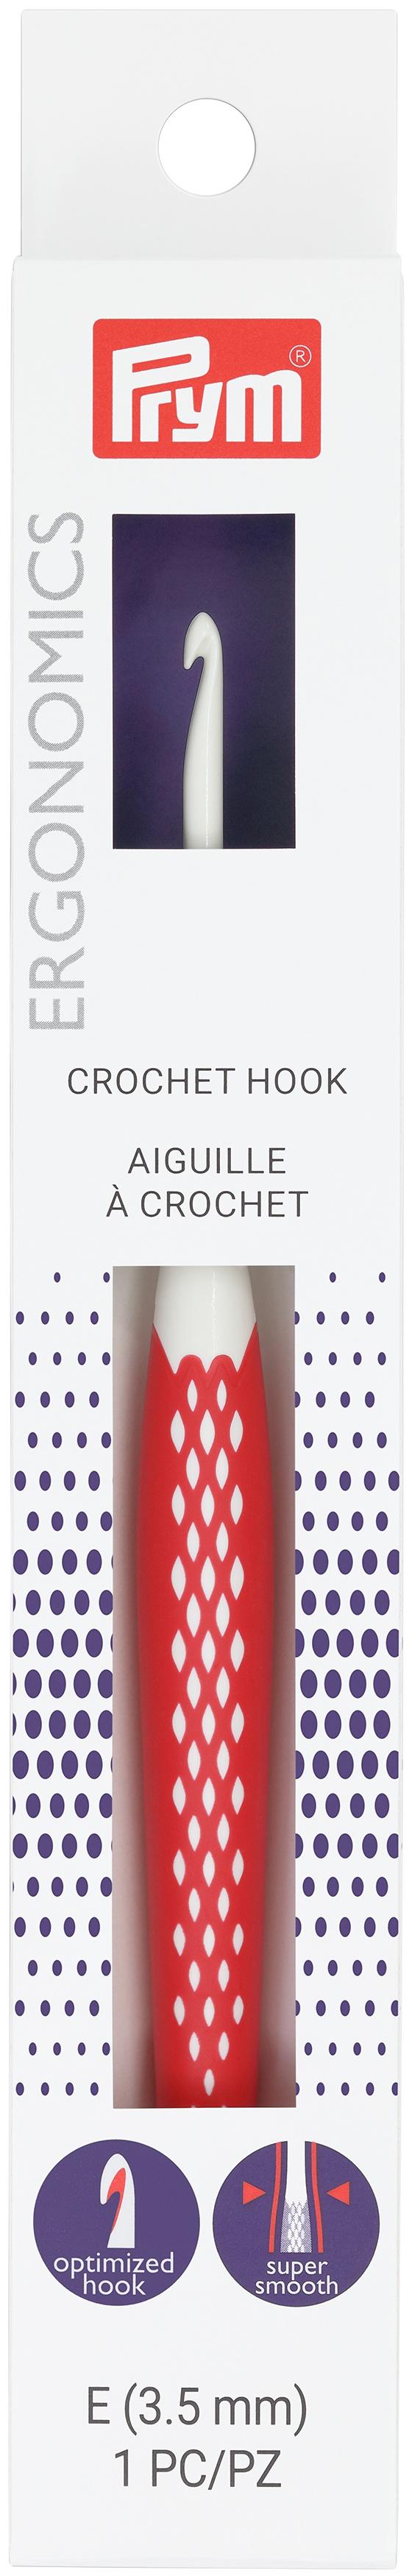 Prym Crochet Hook-Size E3/3.5mm